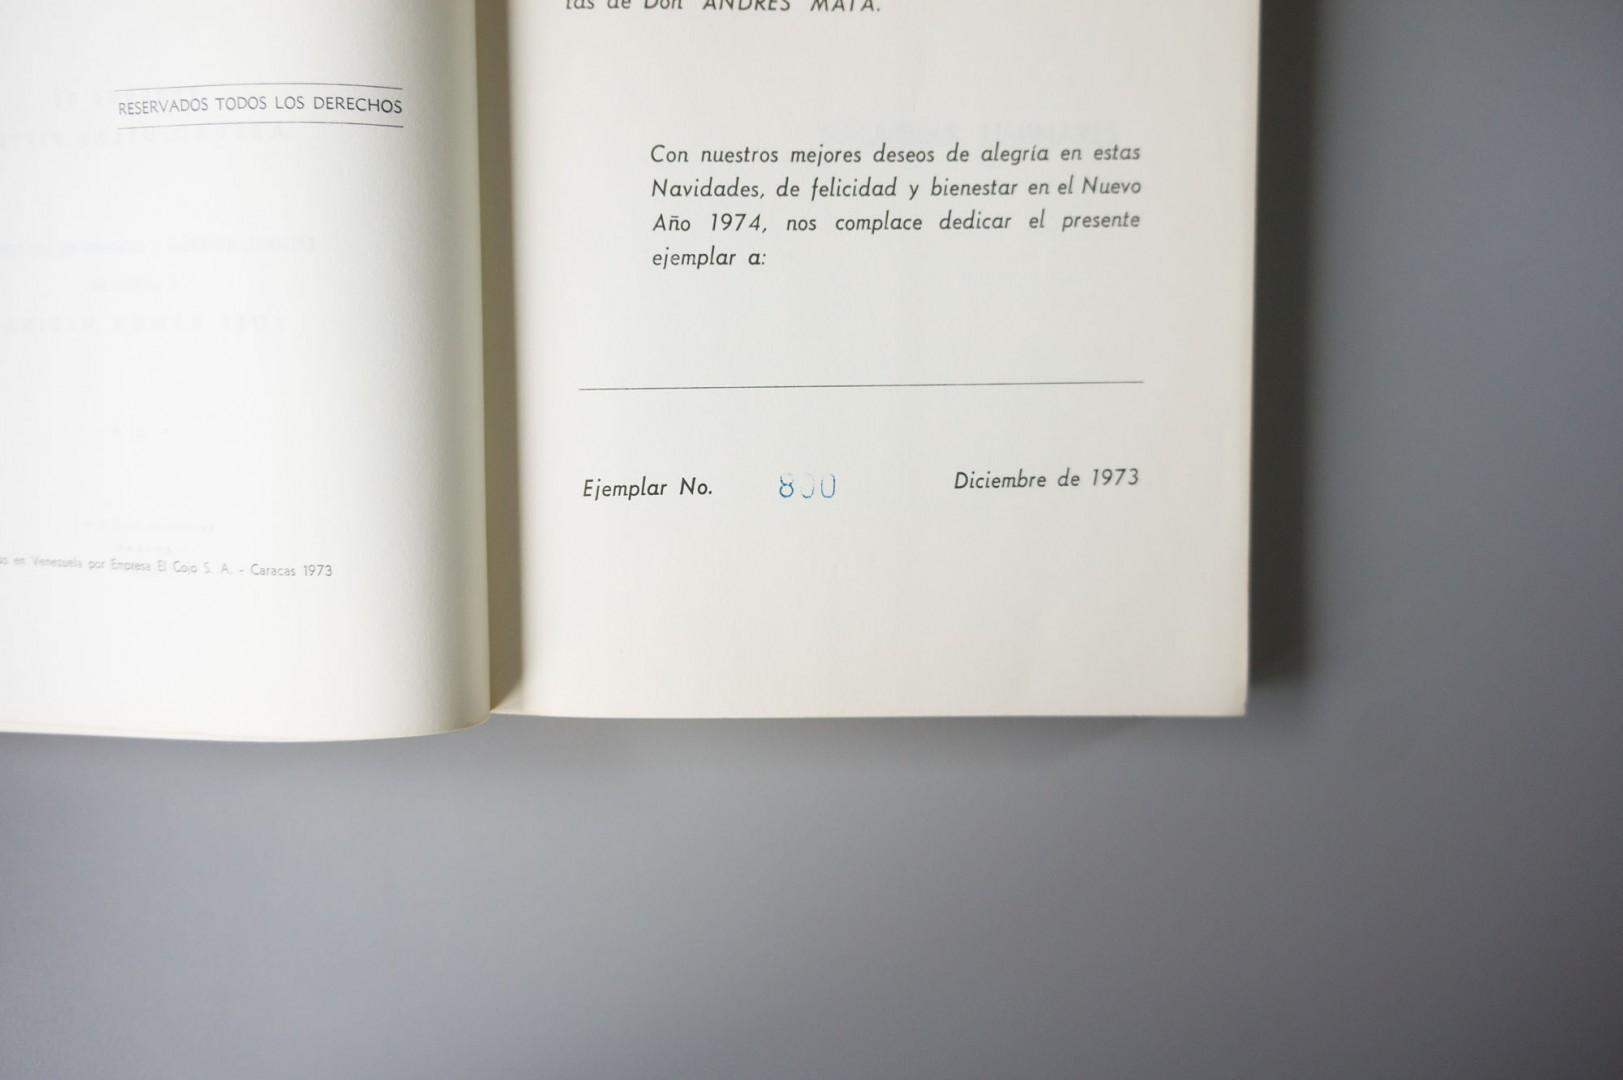 Andres Mata - Poesias Completas (5)